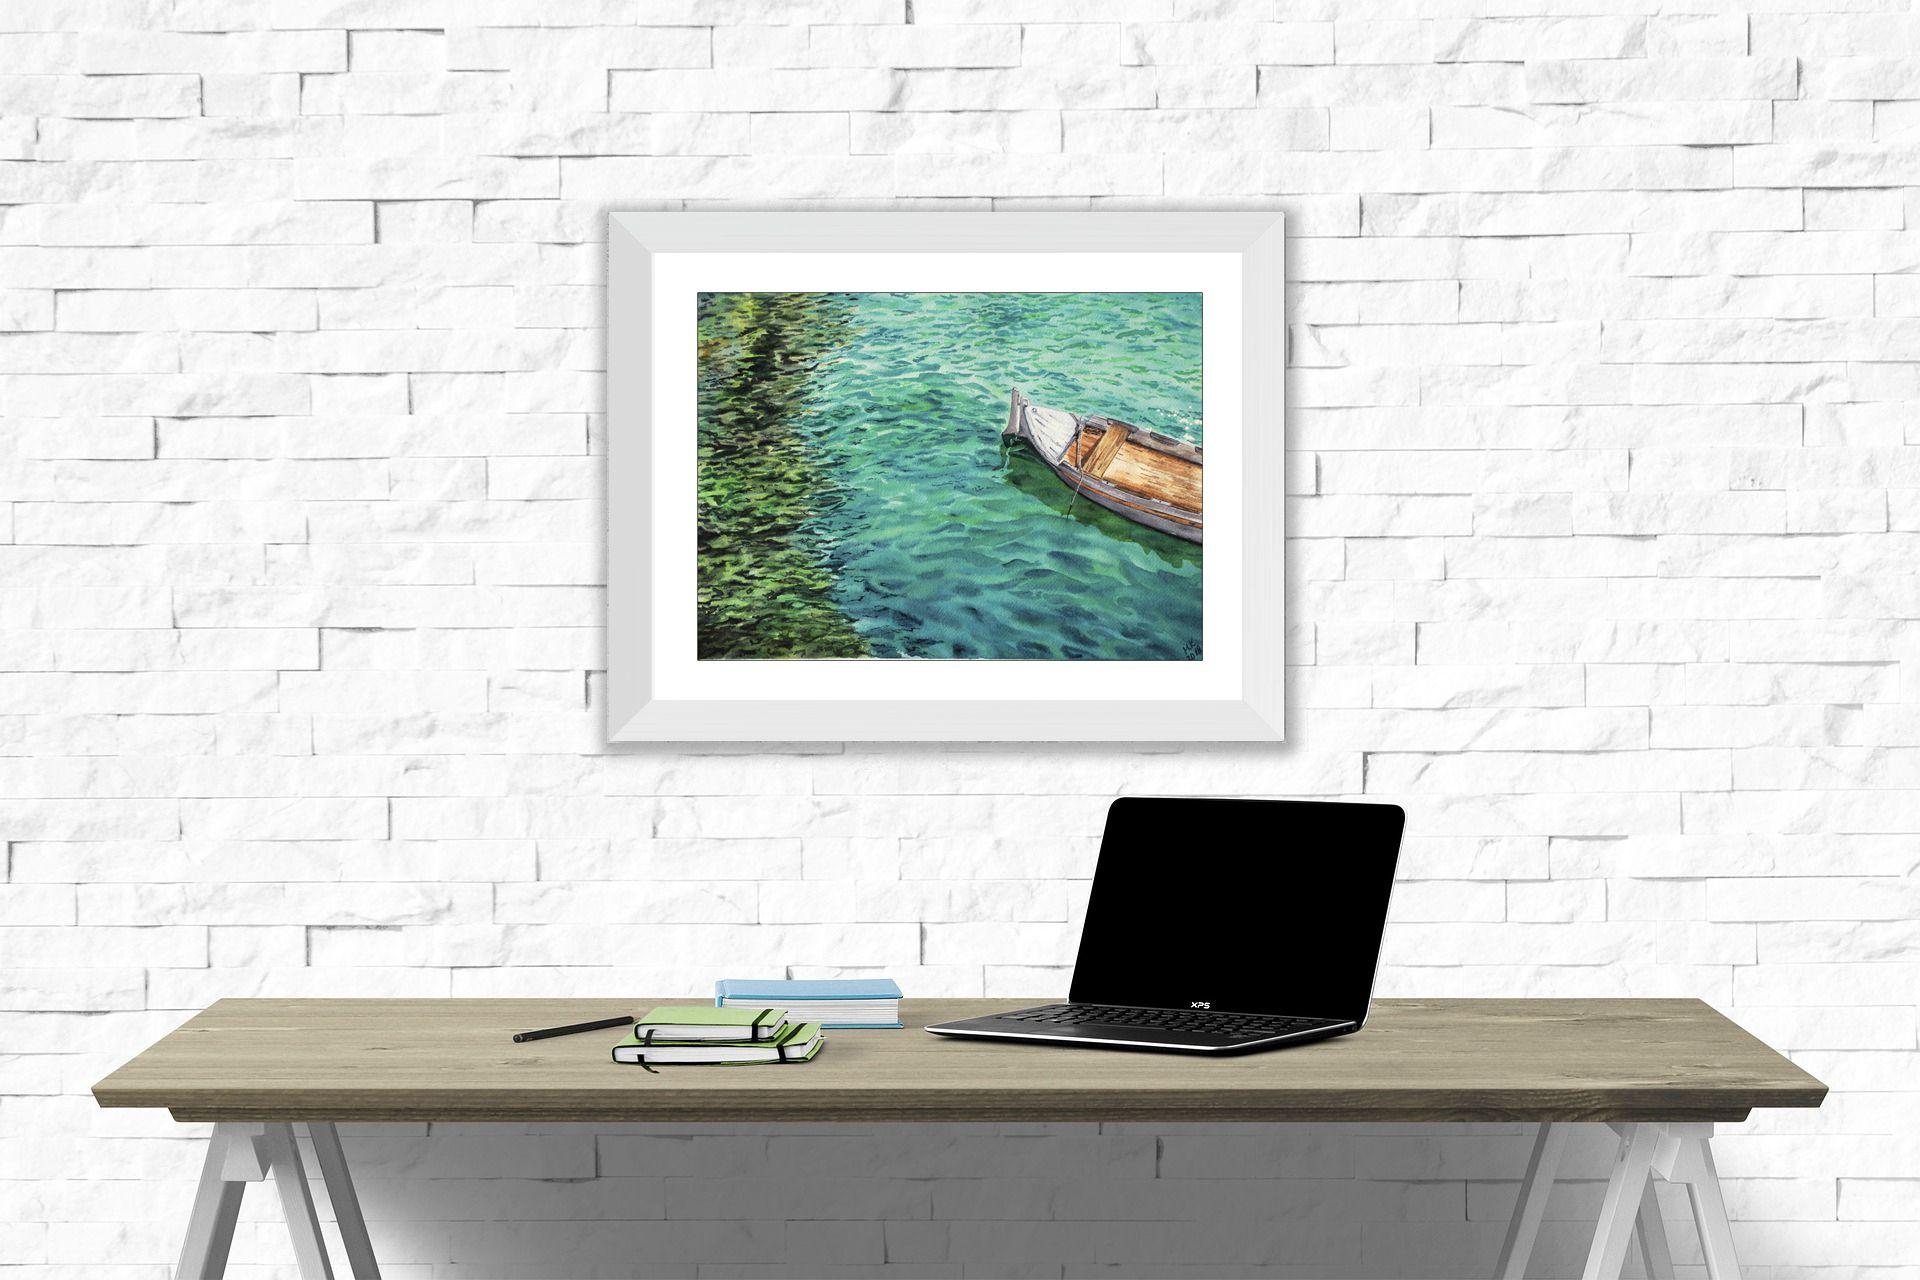 watercolorart seapainting interiorart boatonwater summerscene naturepainting livingroomart